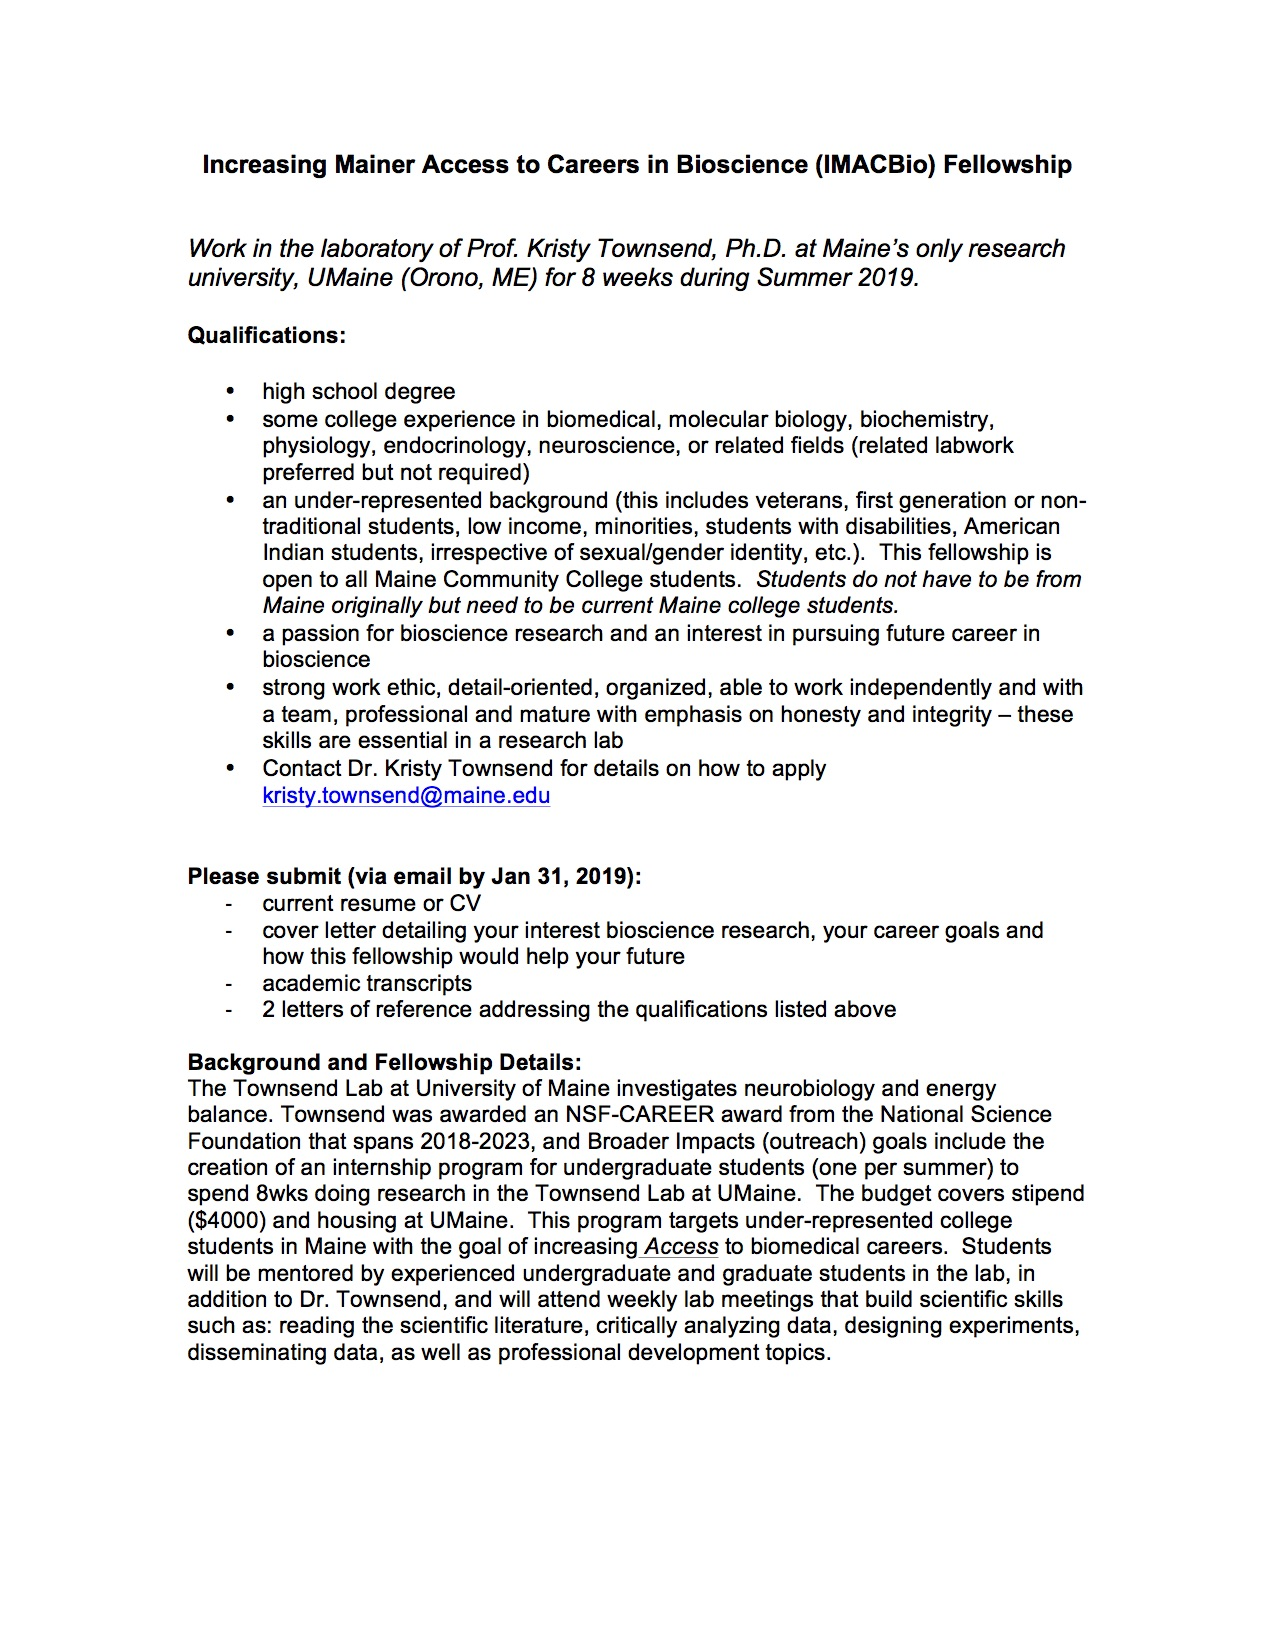 NSF internship Townsend UMaine Summer 2019.jpg